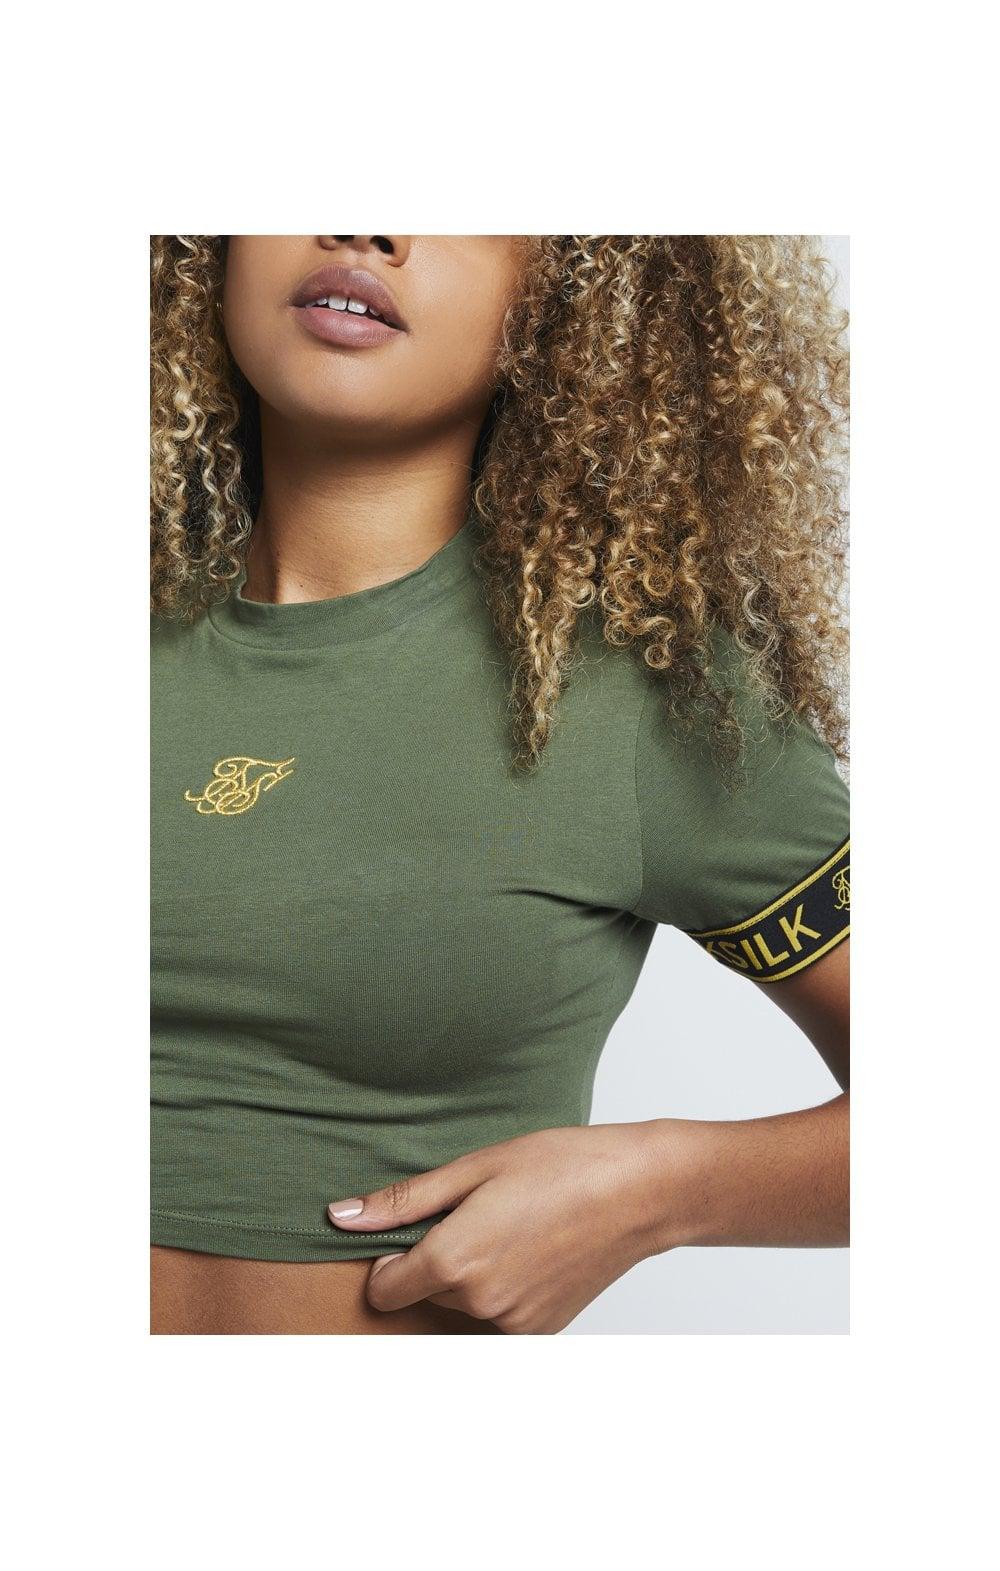 SikSilk Tape Cuff Crop Tee - Bronze Green  WOMEN SIZES: 6-XXS